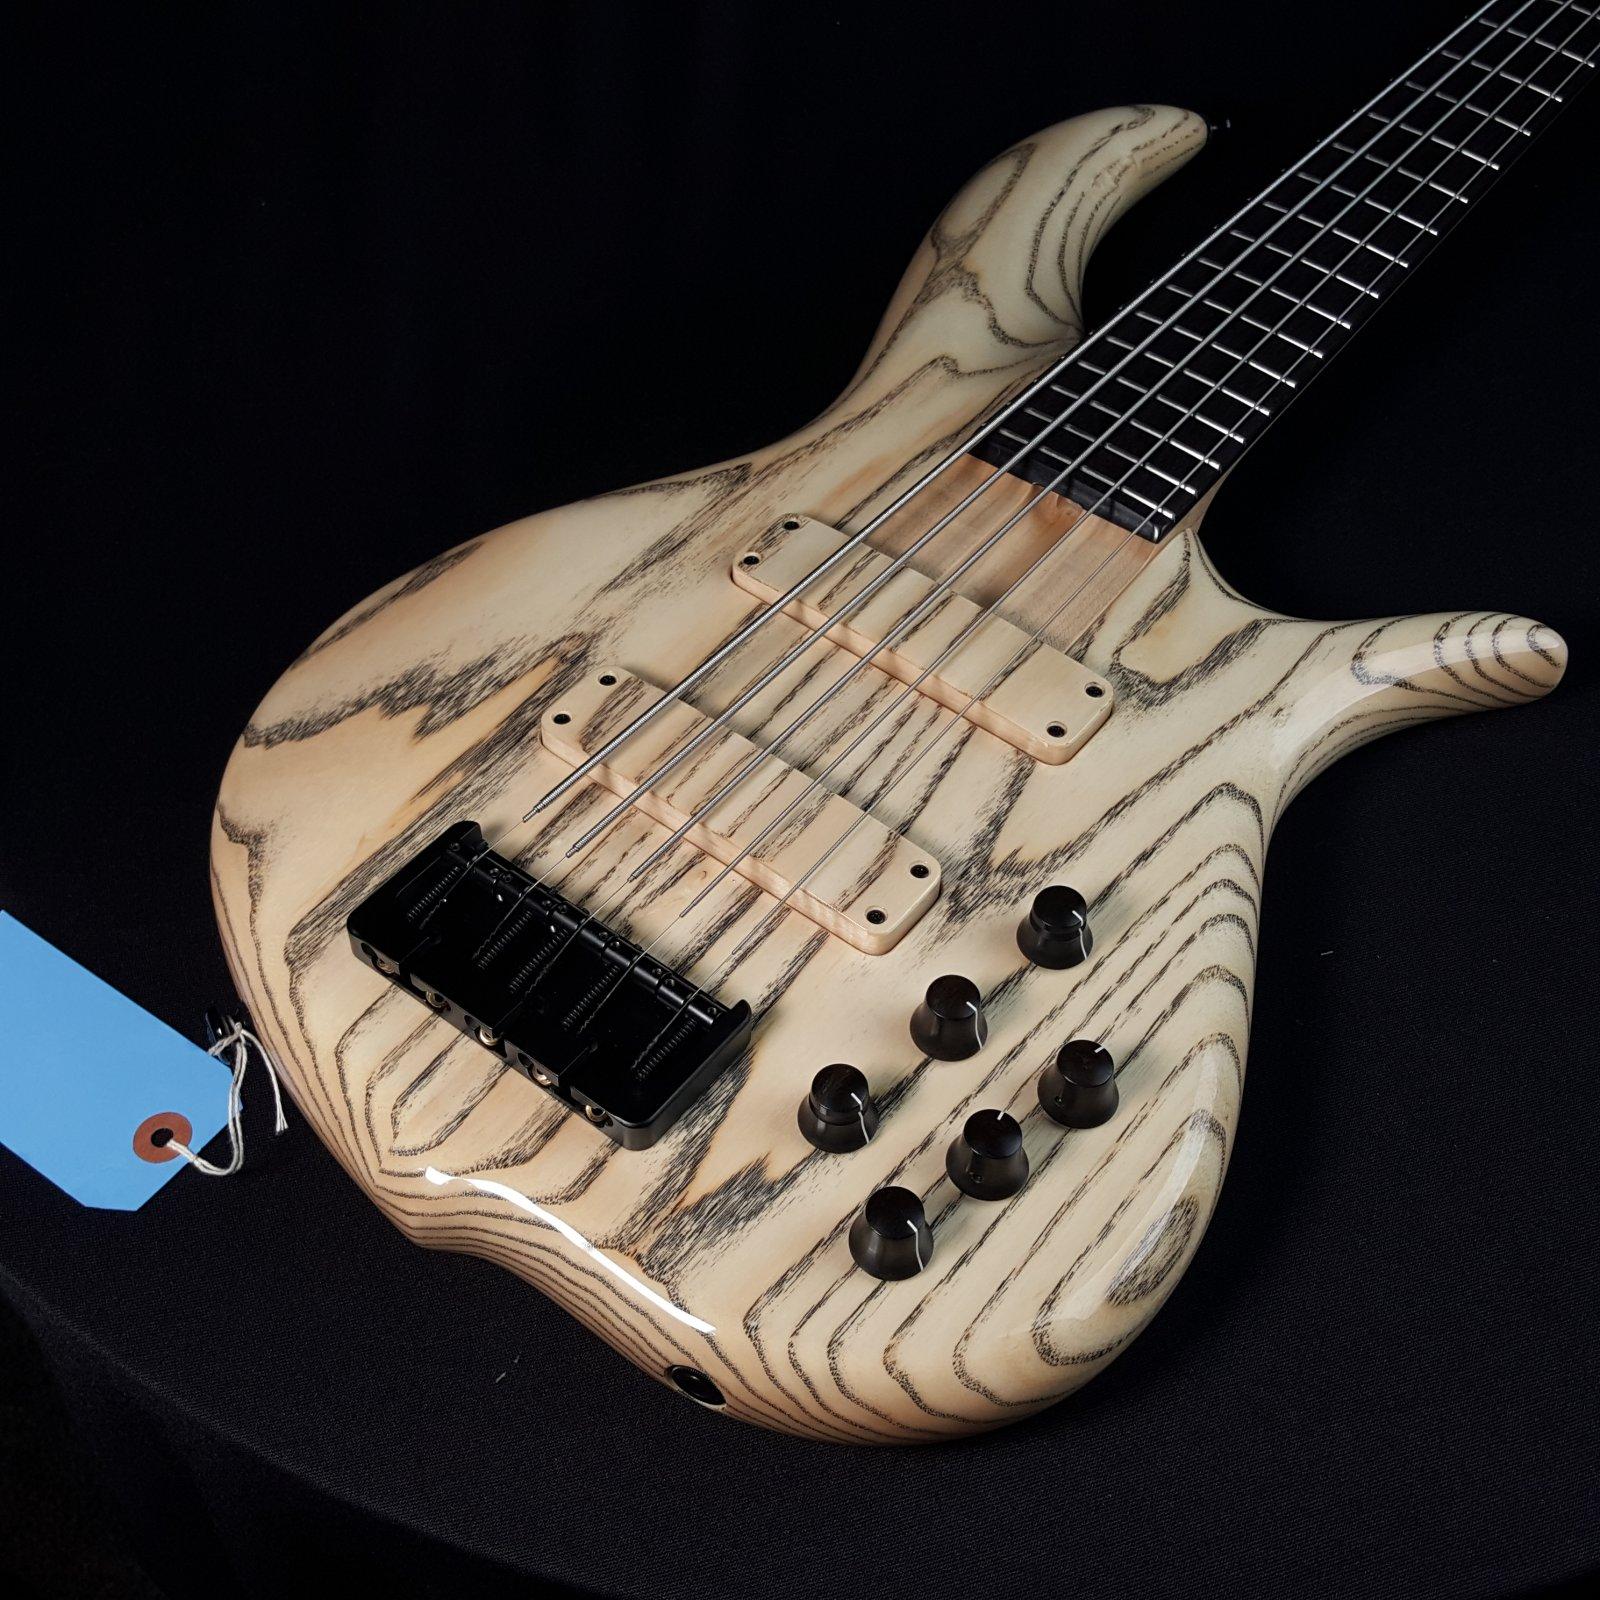 F Bass BN5 Ash 5 String Ebony Board Natural Gloss with Bag